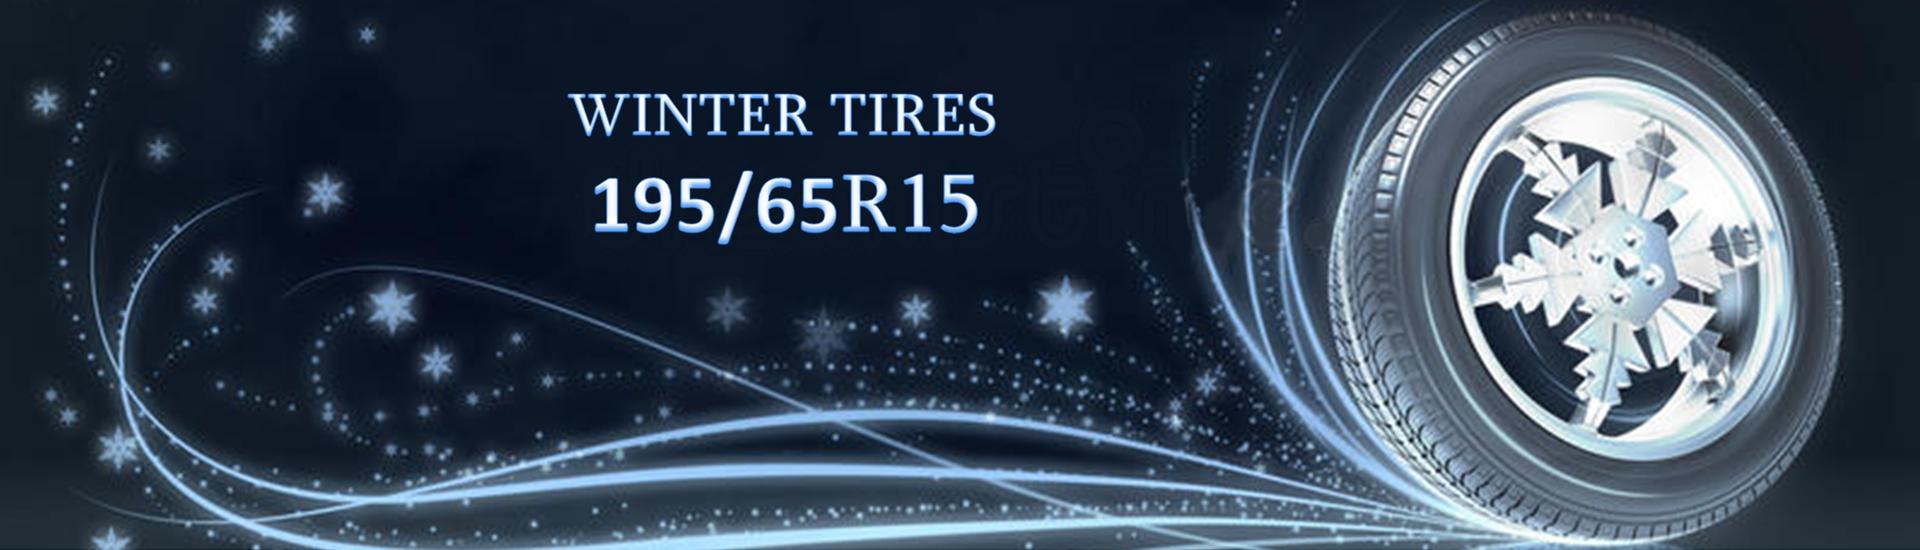 Winter Tires 195/65R15